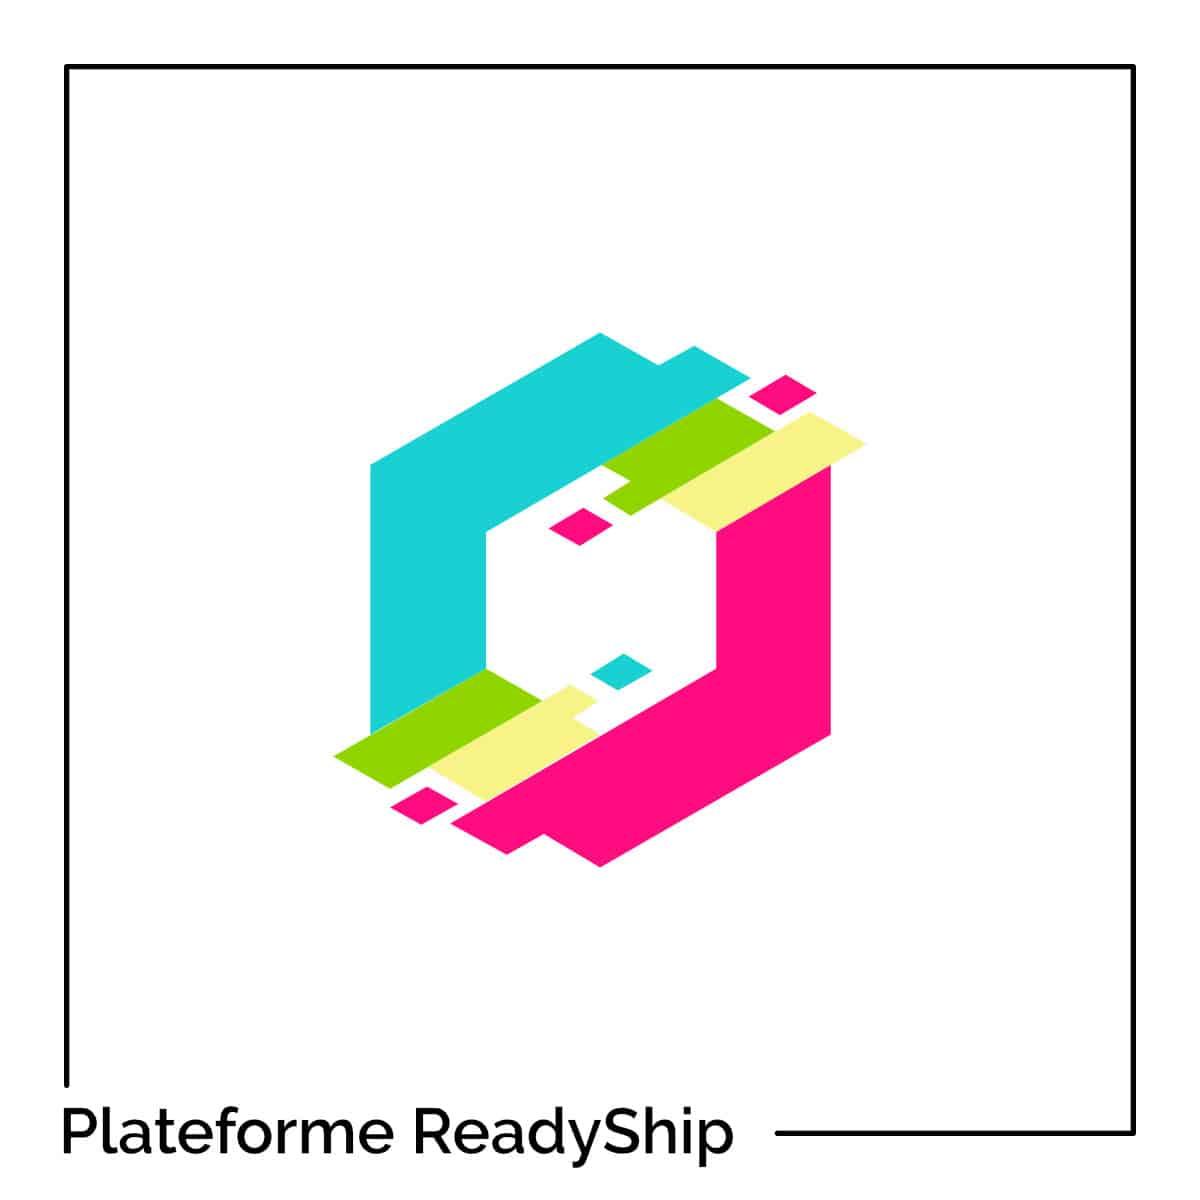 plateforme ReadyShip